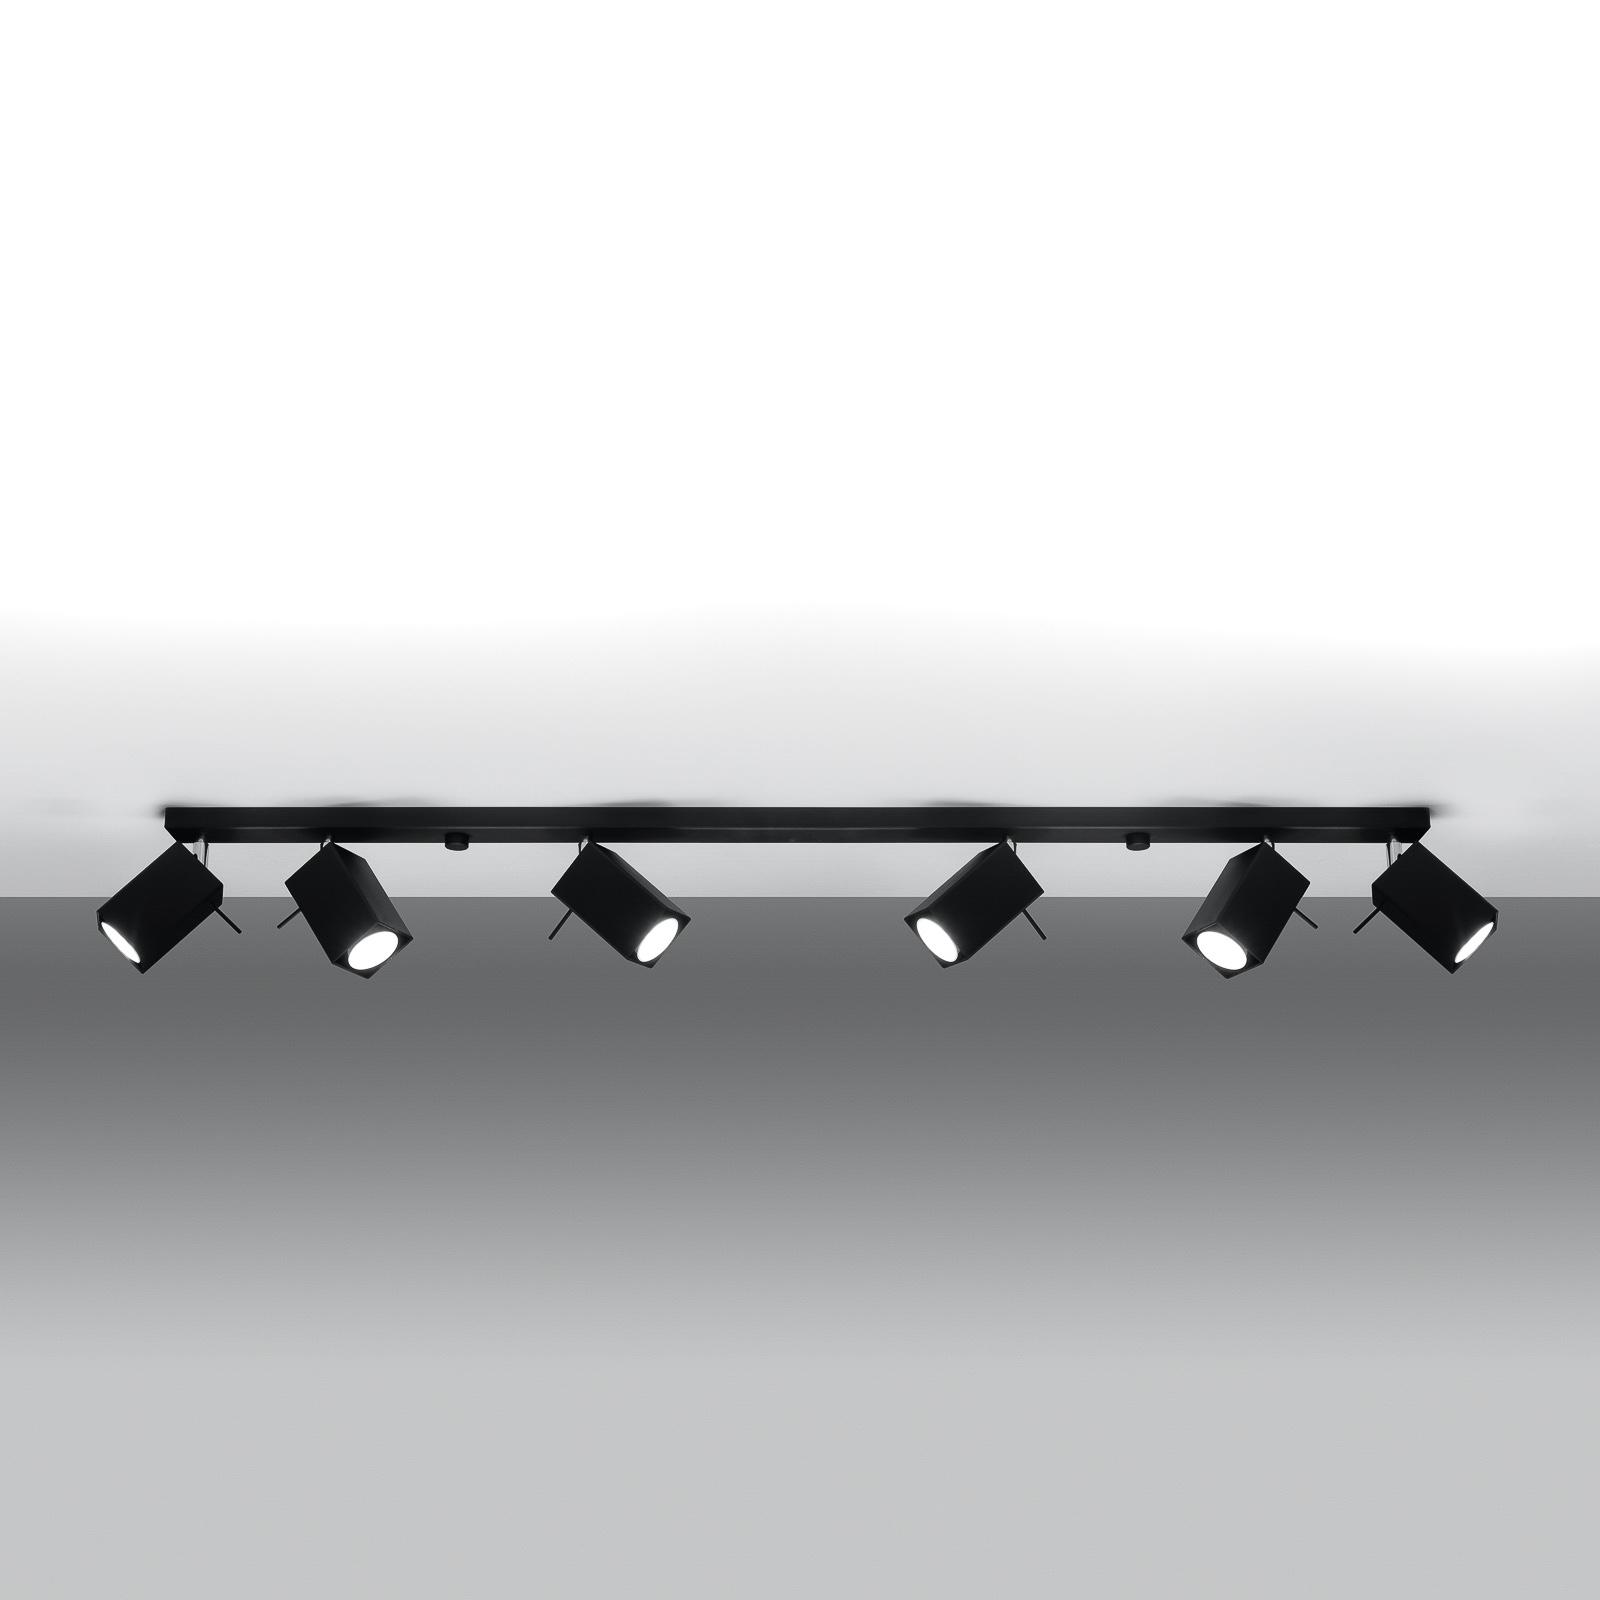 Kattospotti Square, musta 6-lamppuinen suora